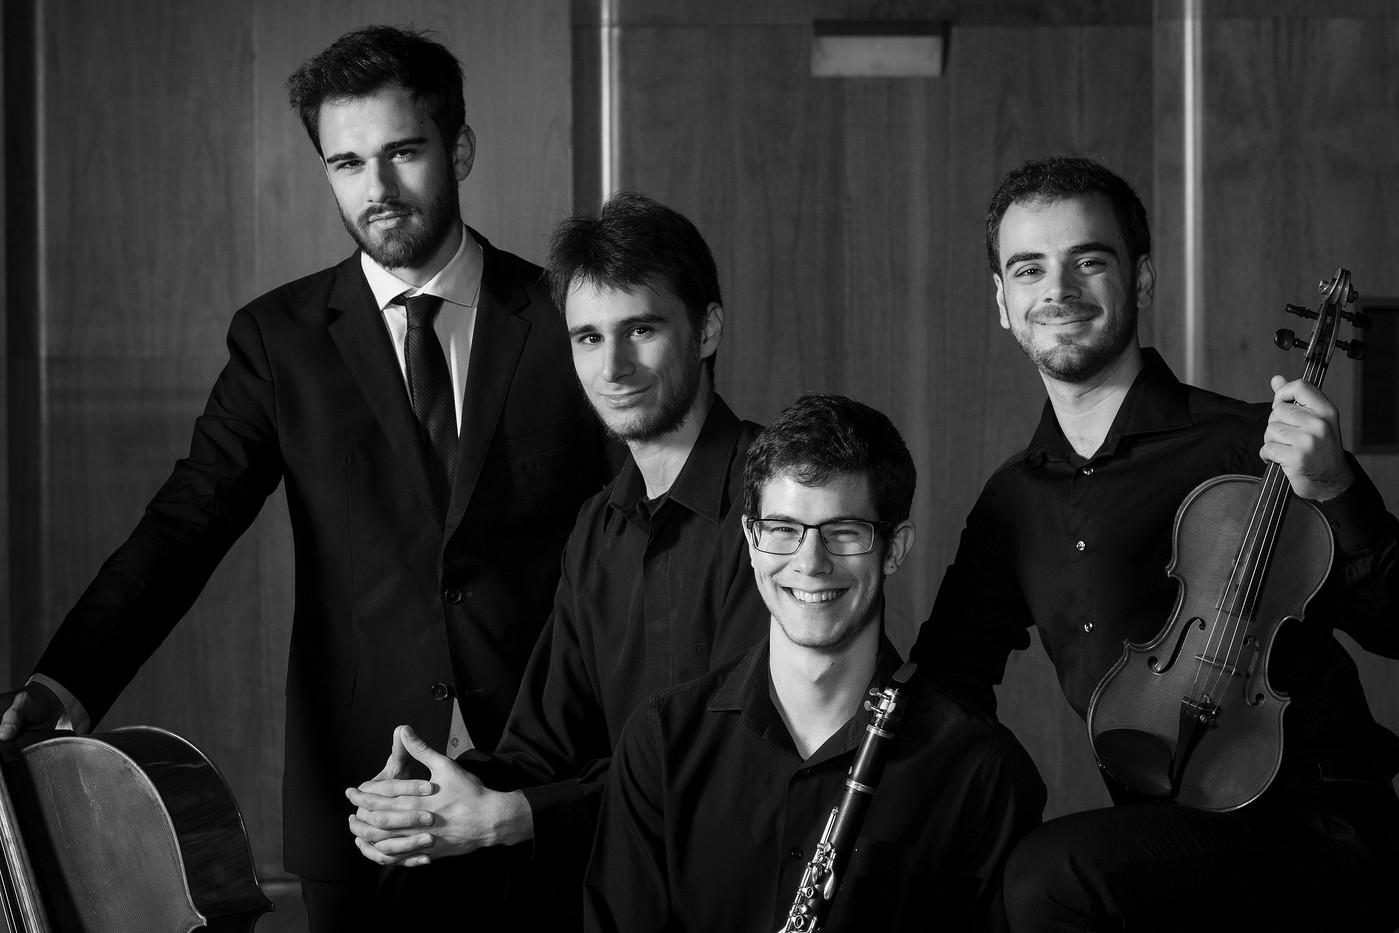 Concierto Messiaen. Grupo Contrastes